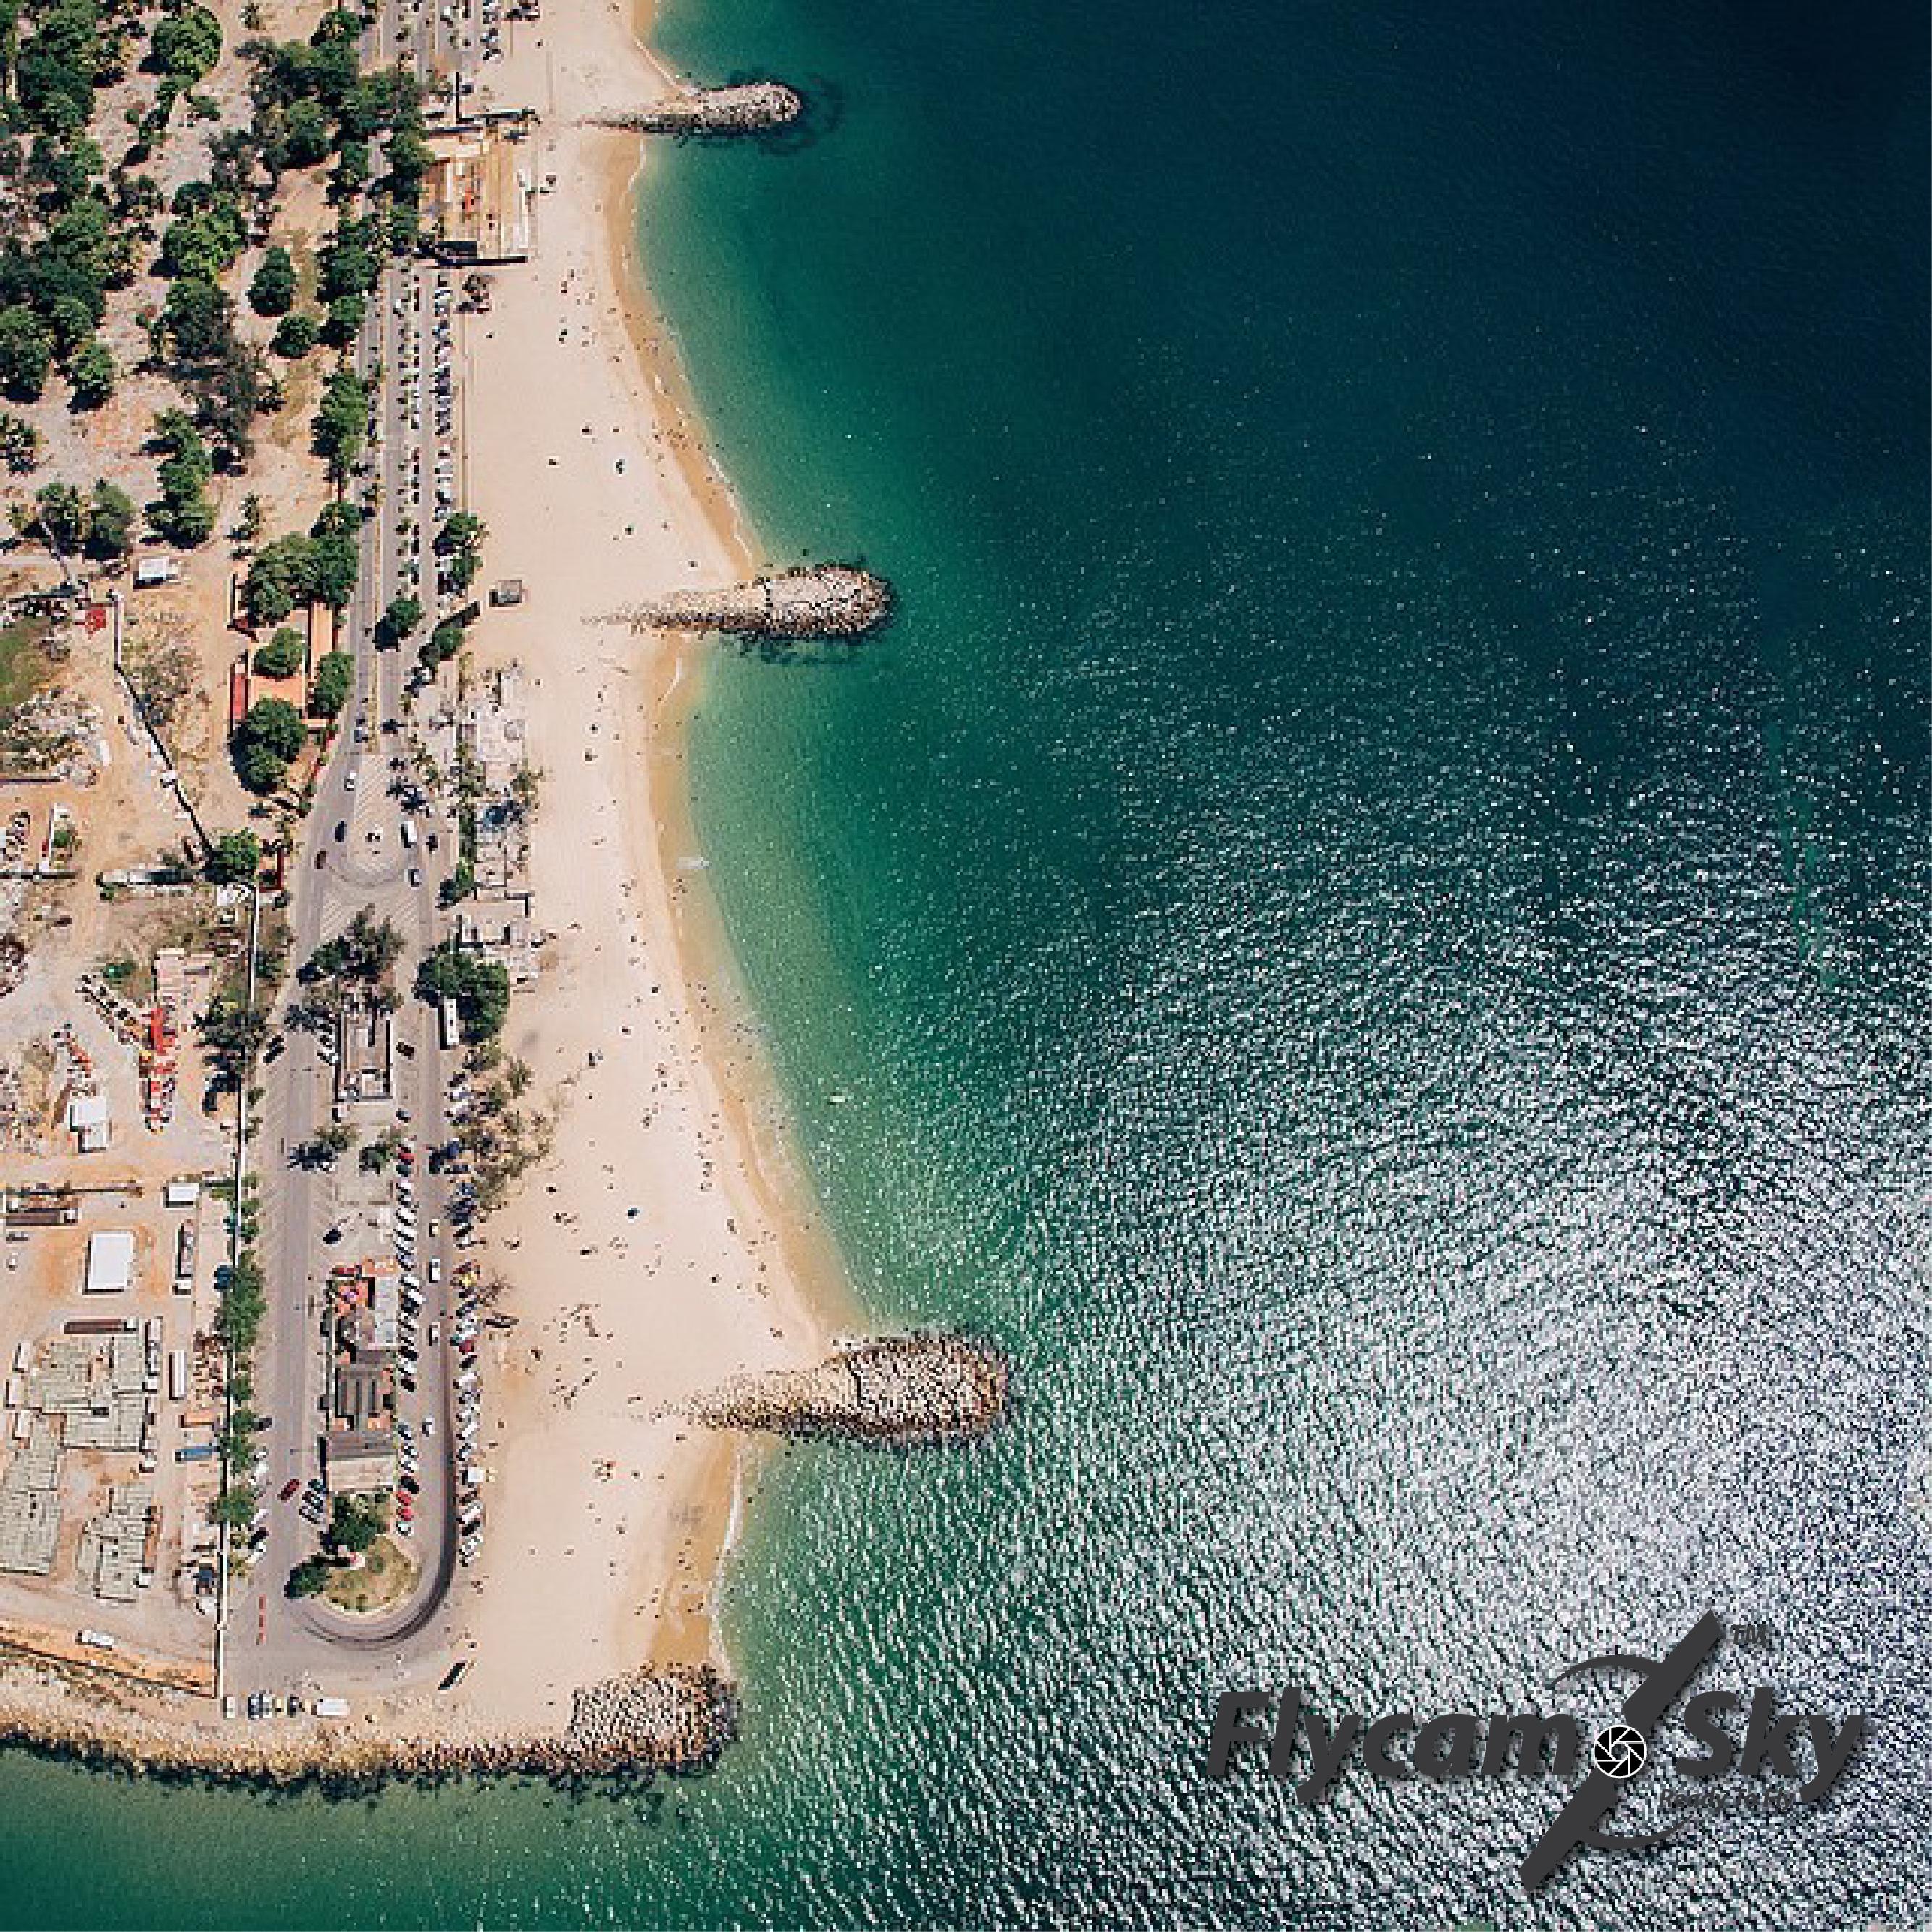 Flycam quay du lịch